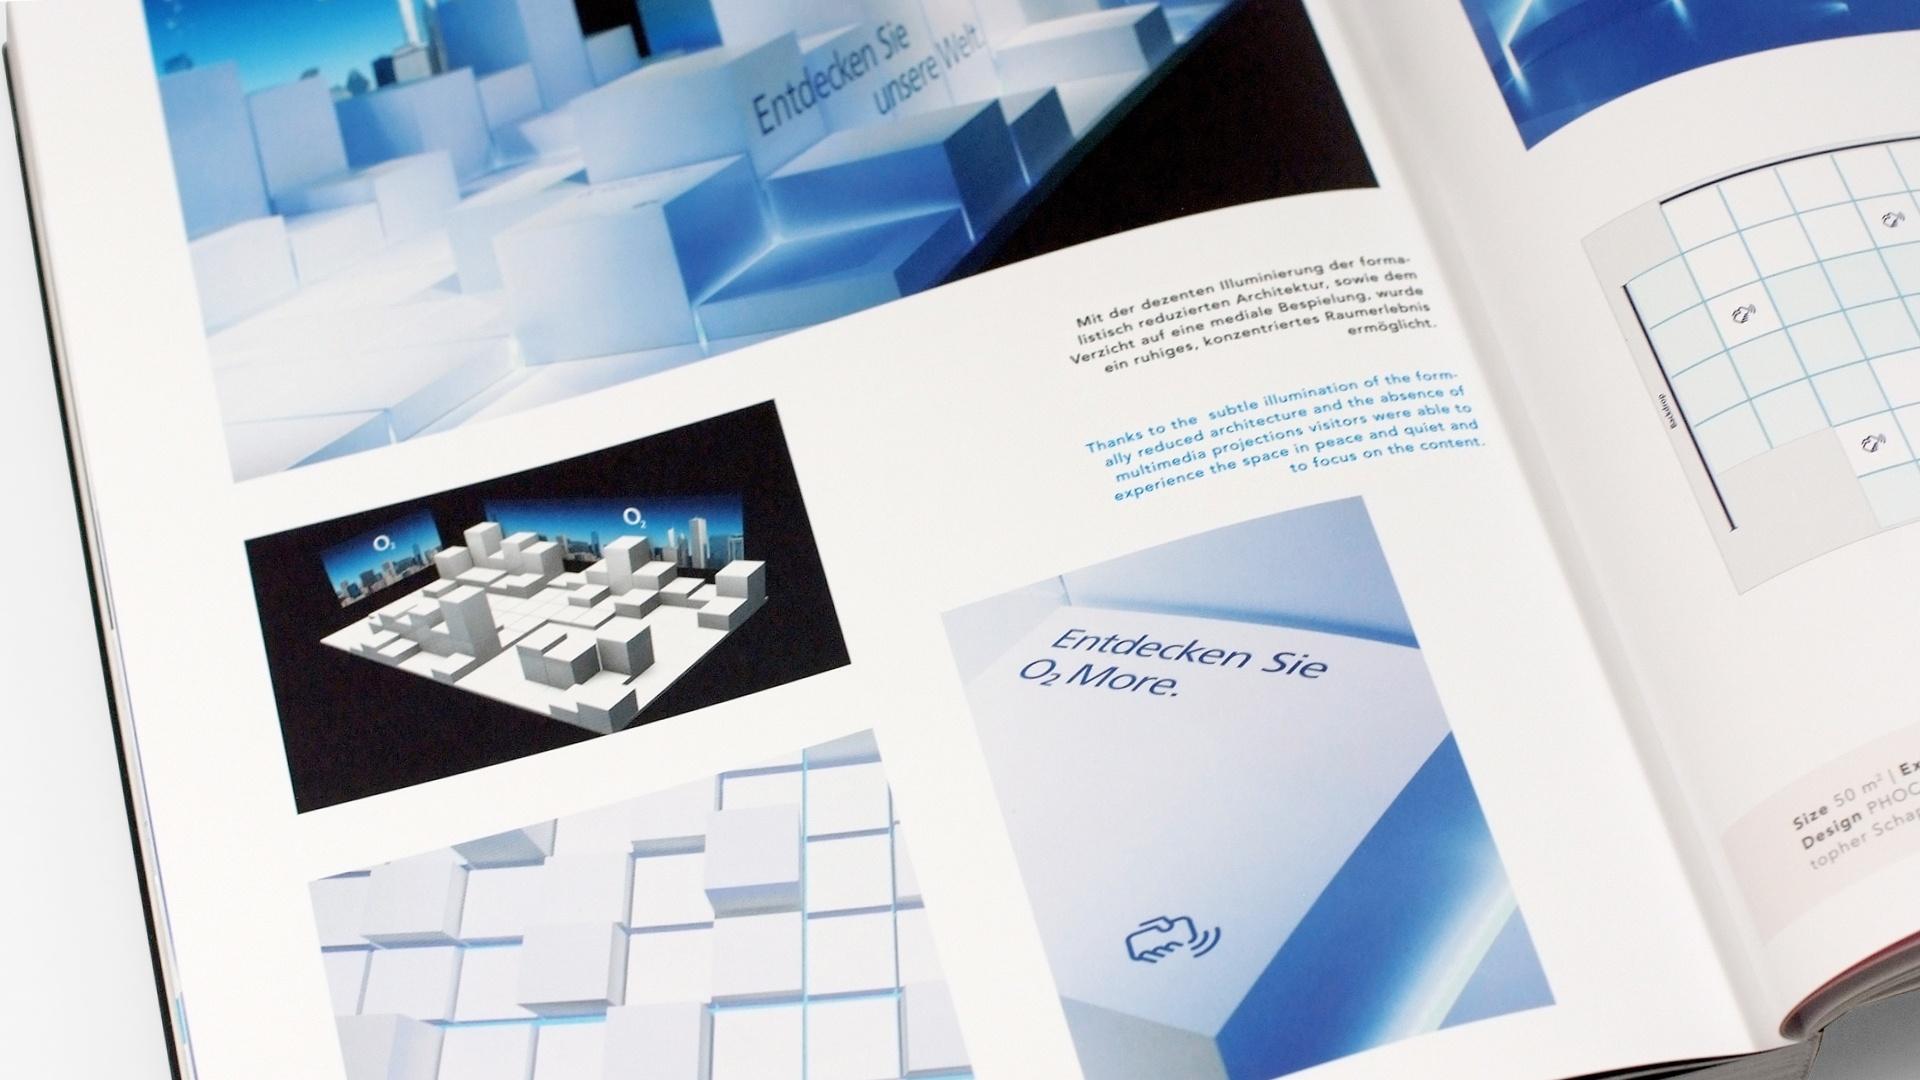 Phocus Brand Contact im Messedesign Jahrbuch 2014/2015